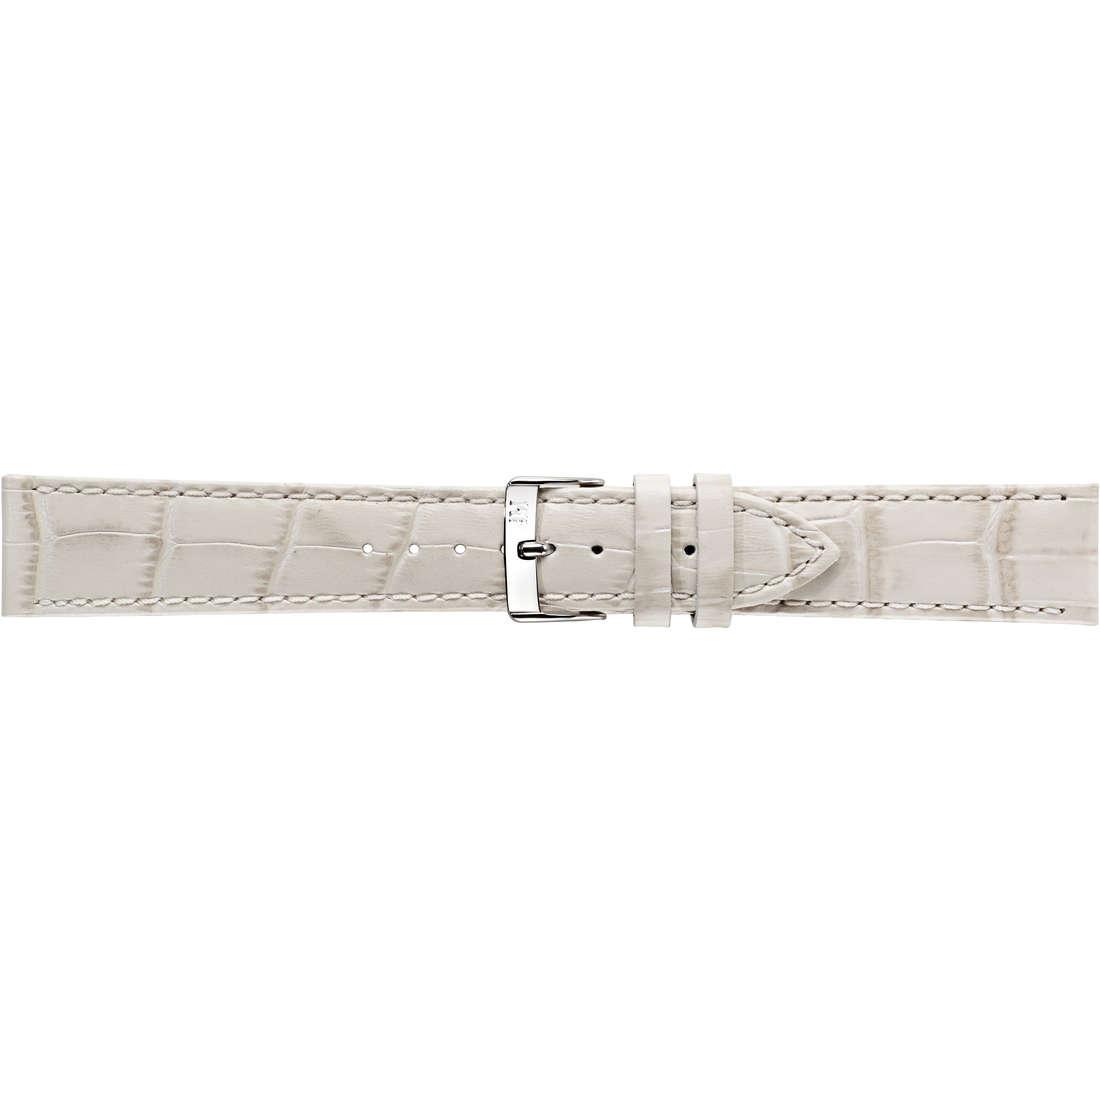 watch watch bands watch straps man Morellato Morellato 1930 A01X2269480026CR12